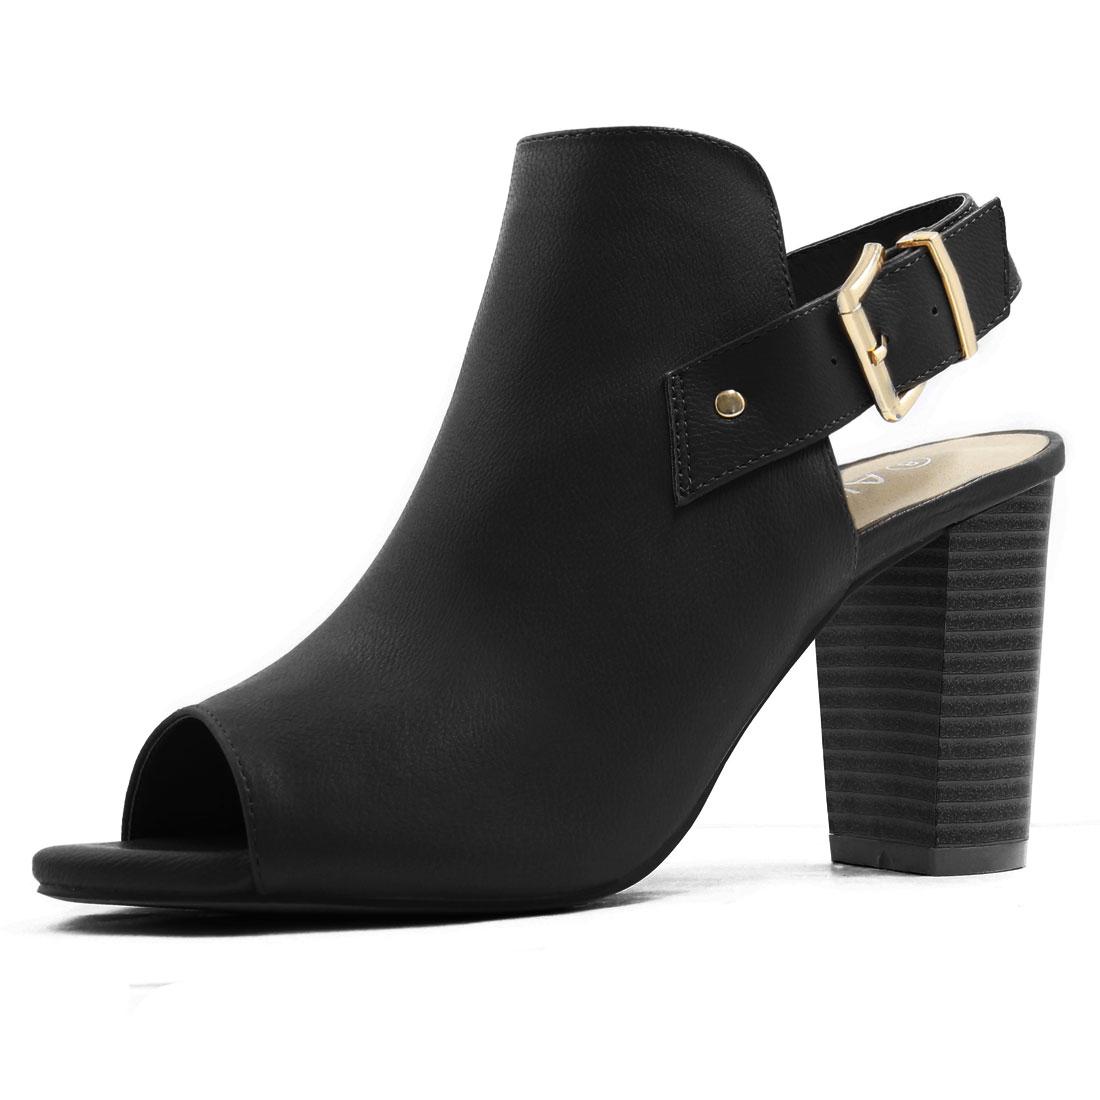 Women Peep Toe Slip On Stacked Heel Slingback Sandals Black US 5.5